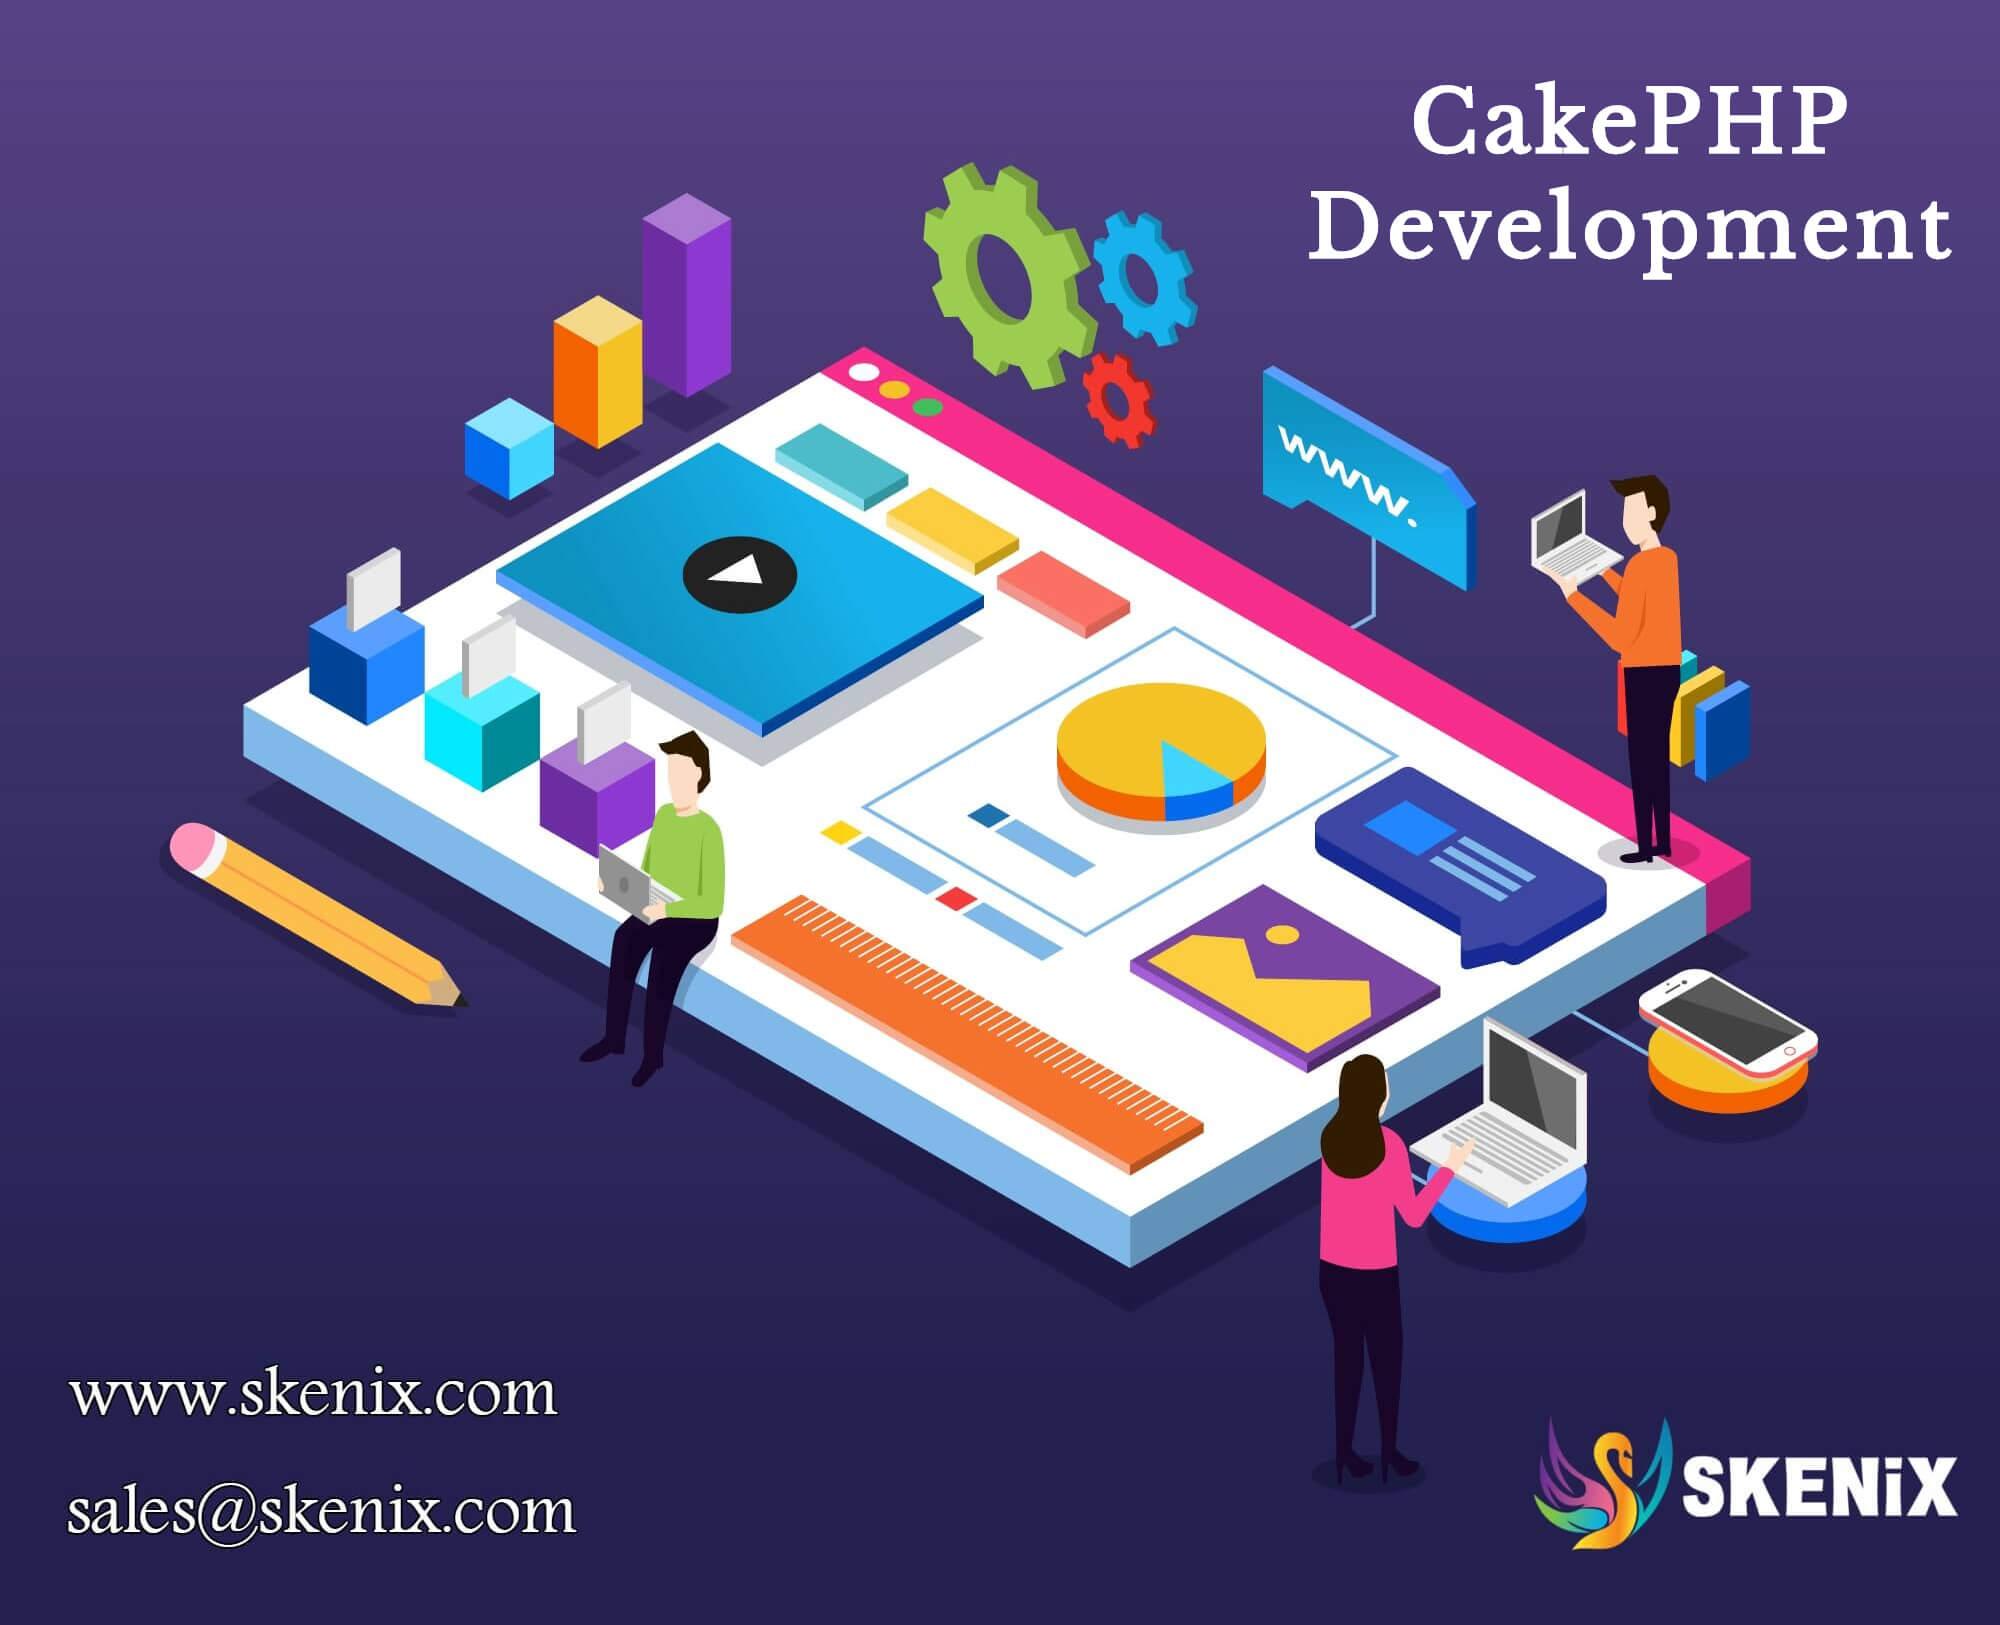 CakePHP Development Company | Hire CakePHP Developers | Skenix